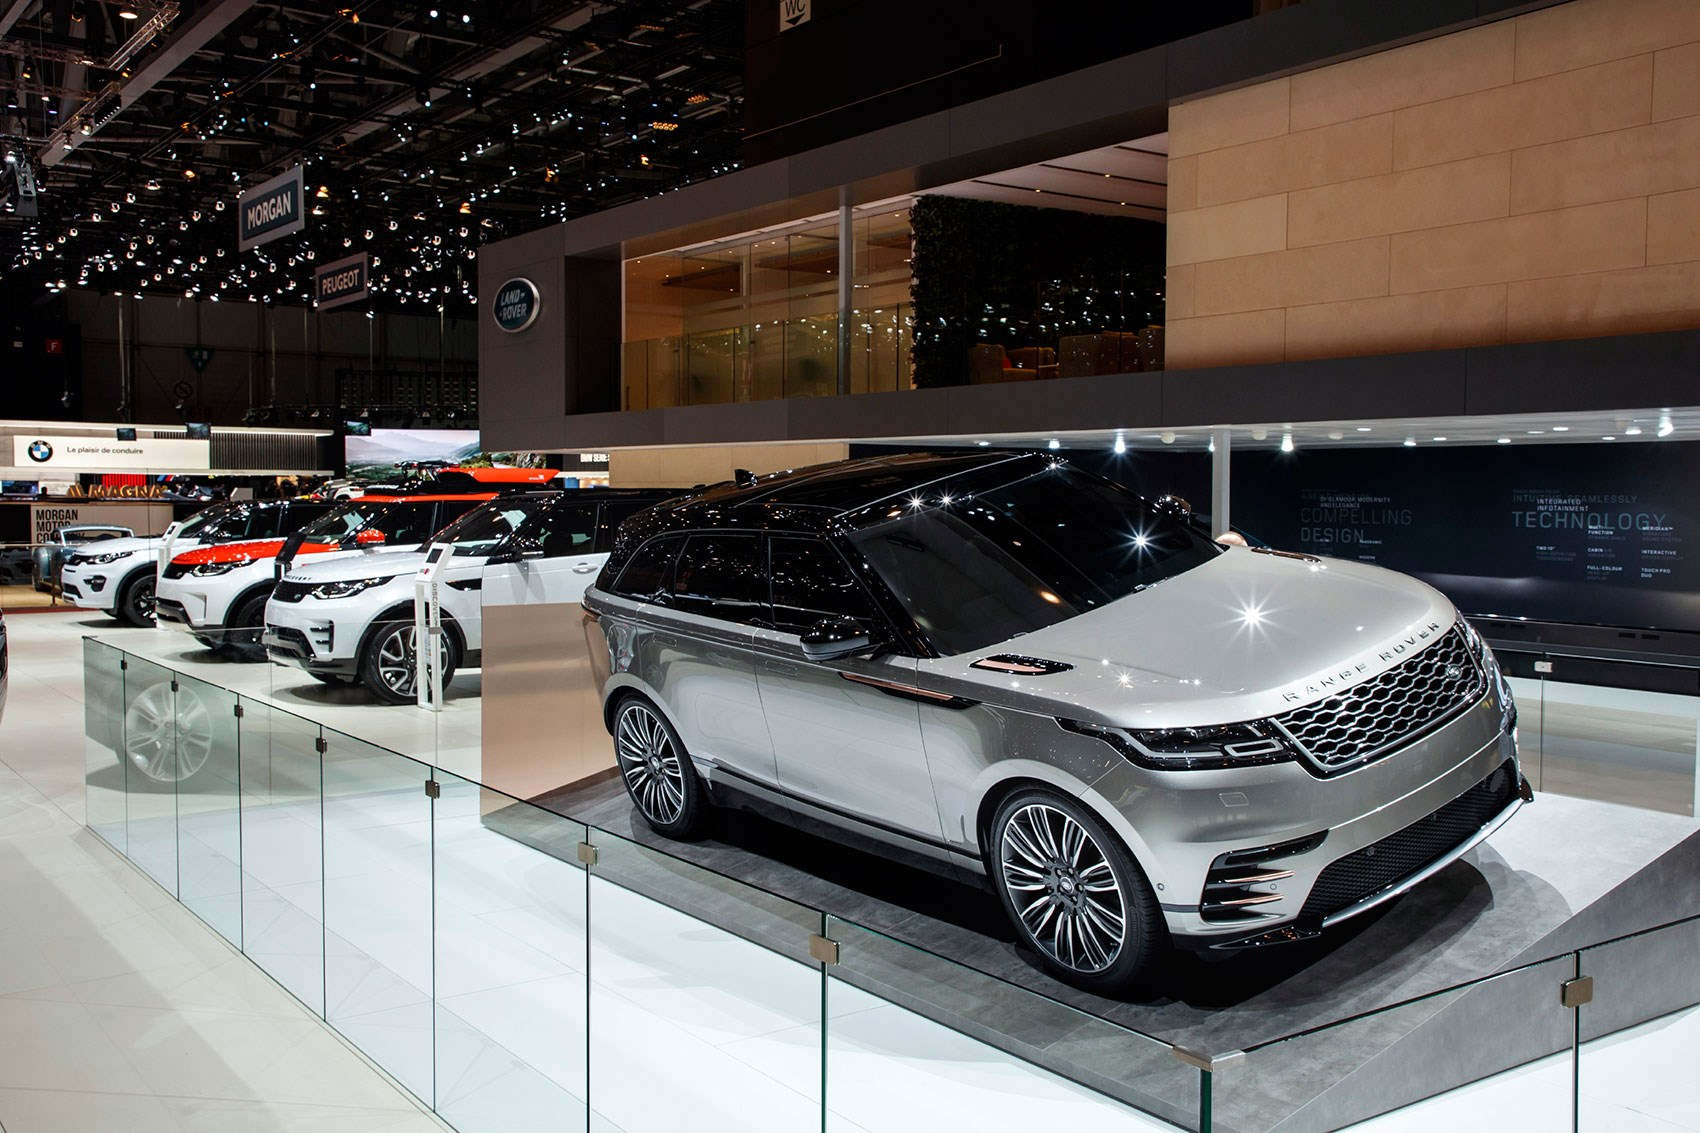 New range rover velar revealed in pictures by car magazine - Geneva car show ...